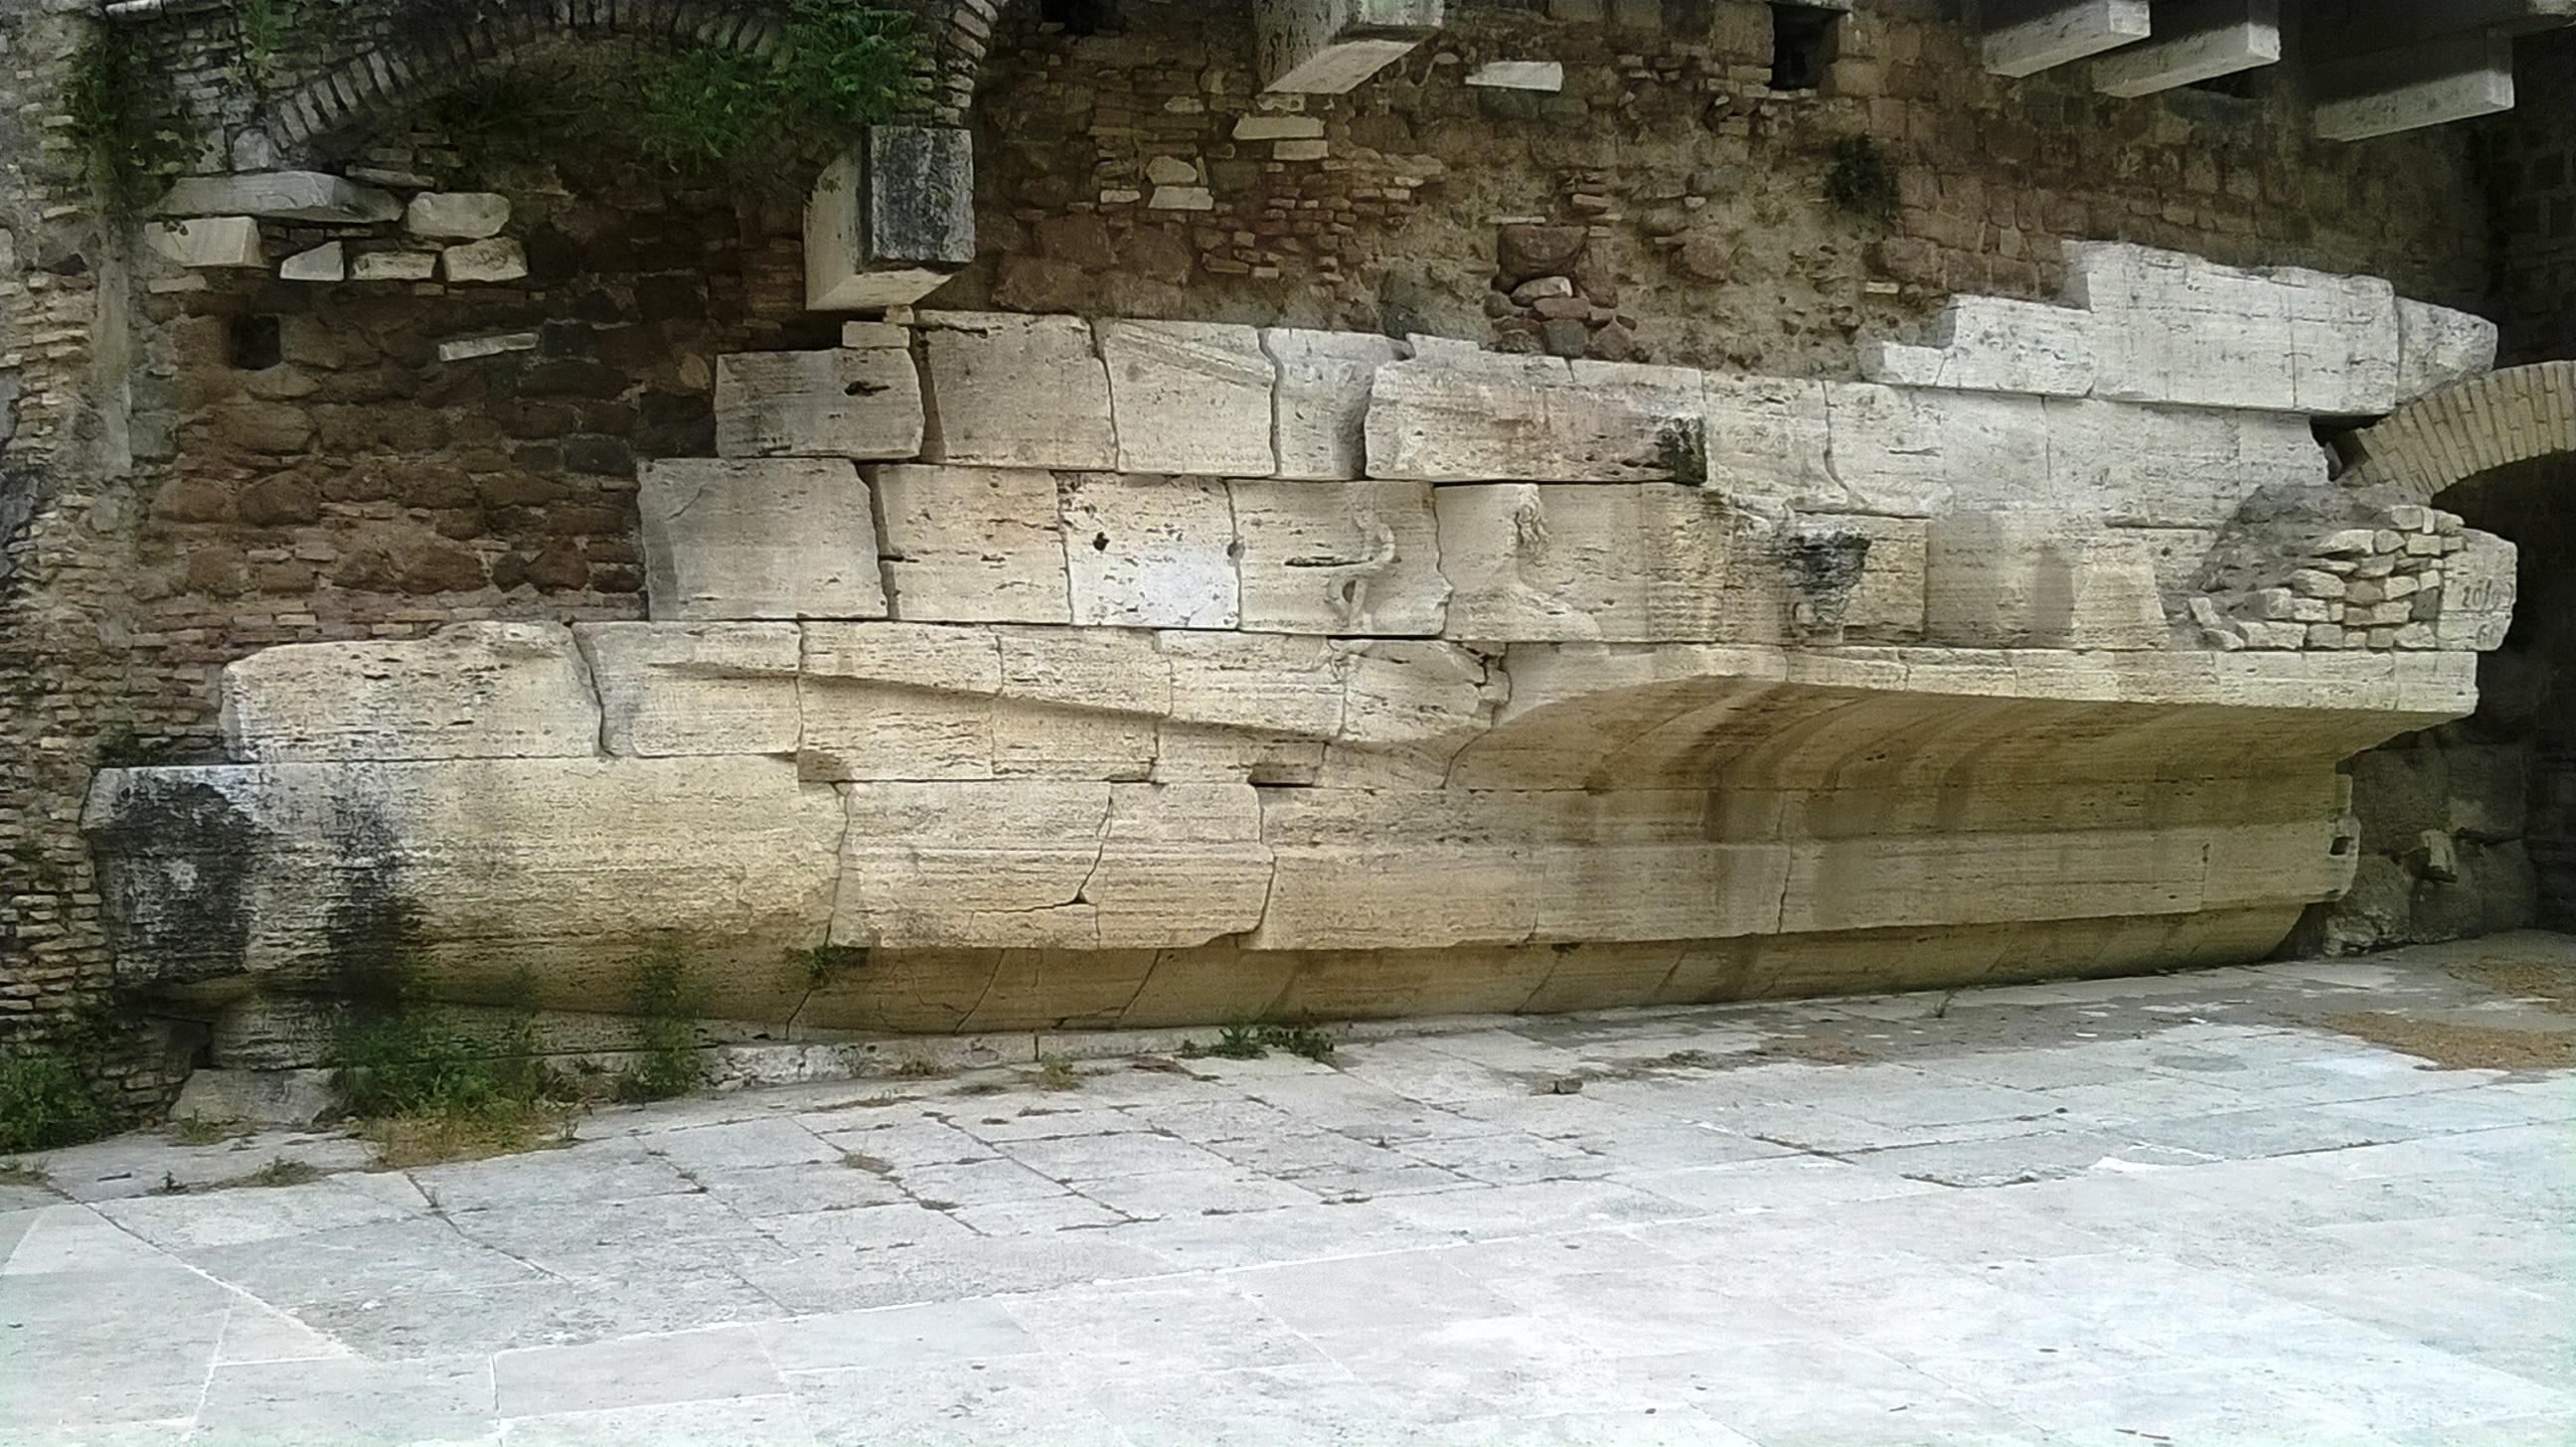 http://www.ancientportsantiques.com/wp-content/uploads/2011/07/Tiberina4.jpg